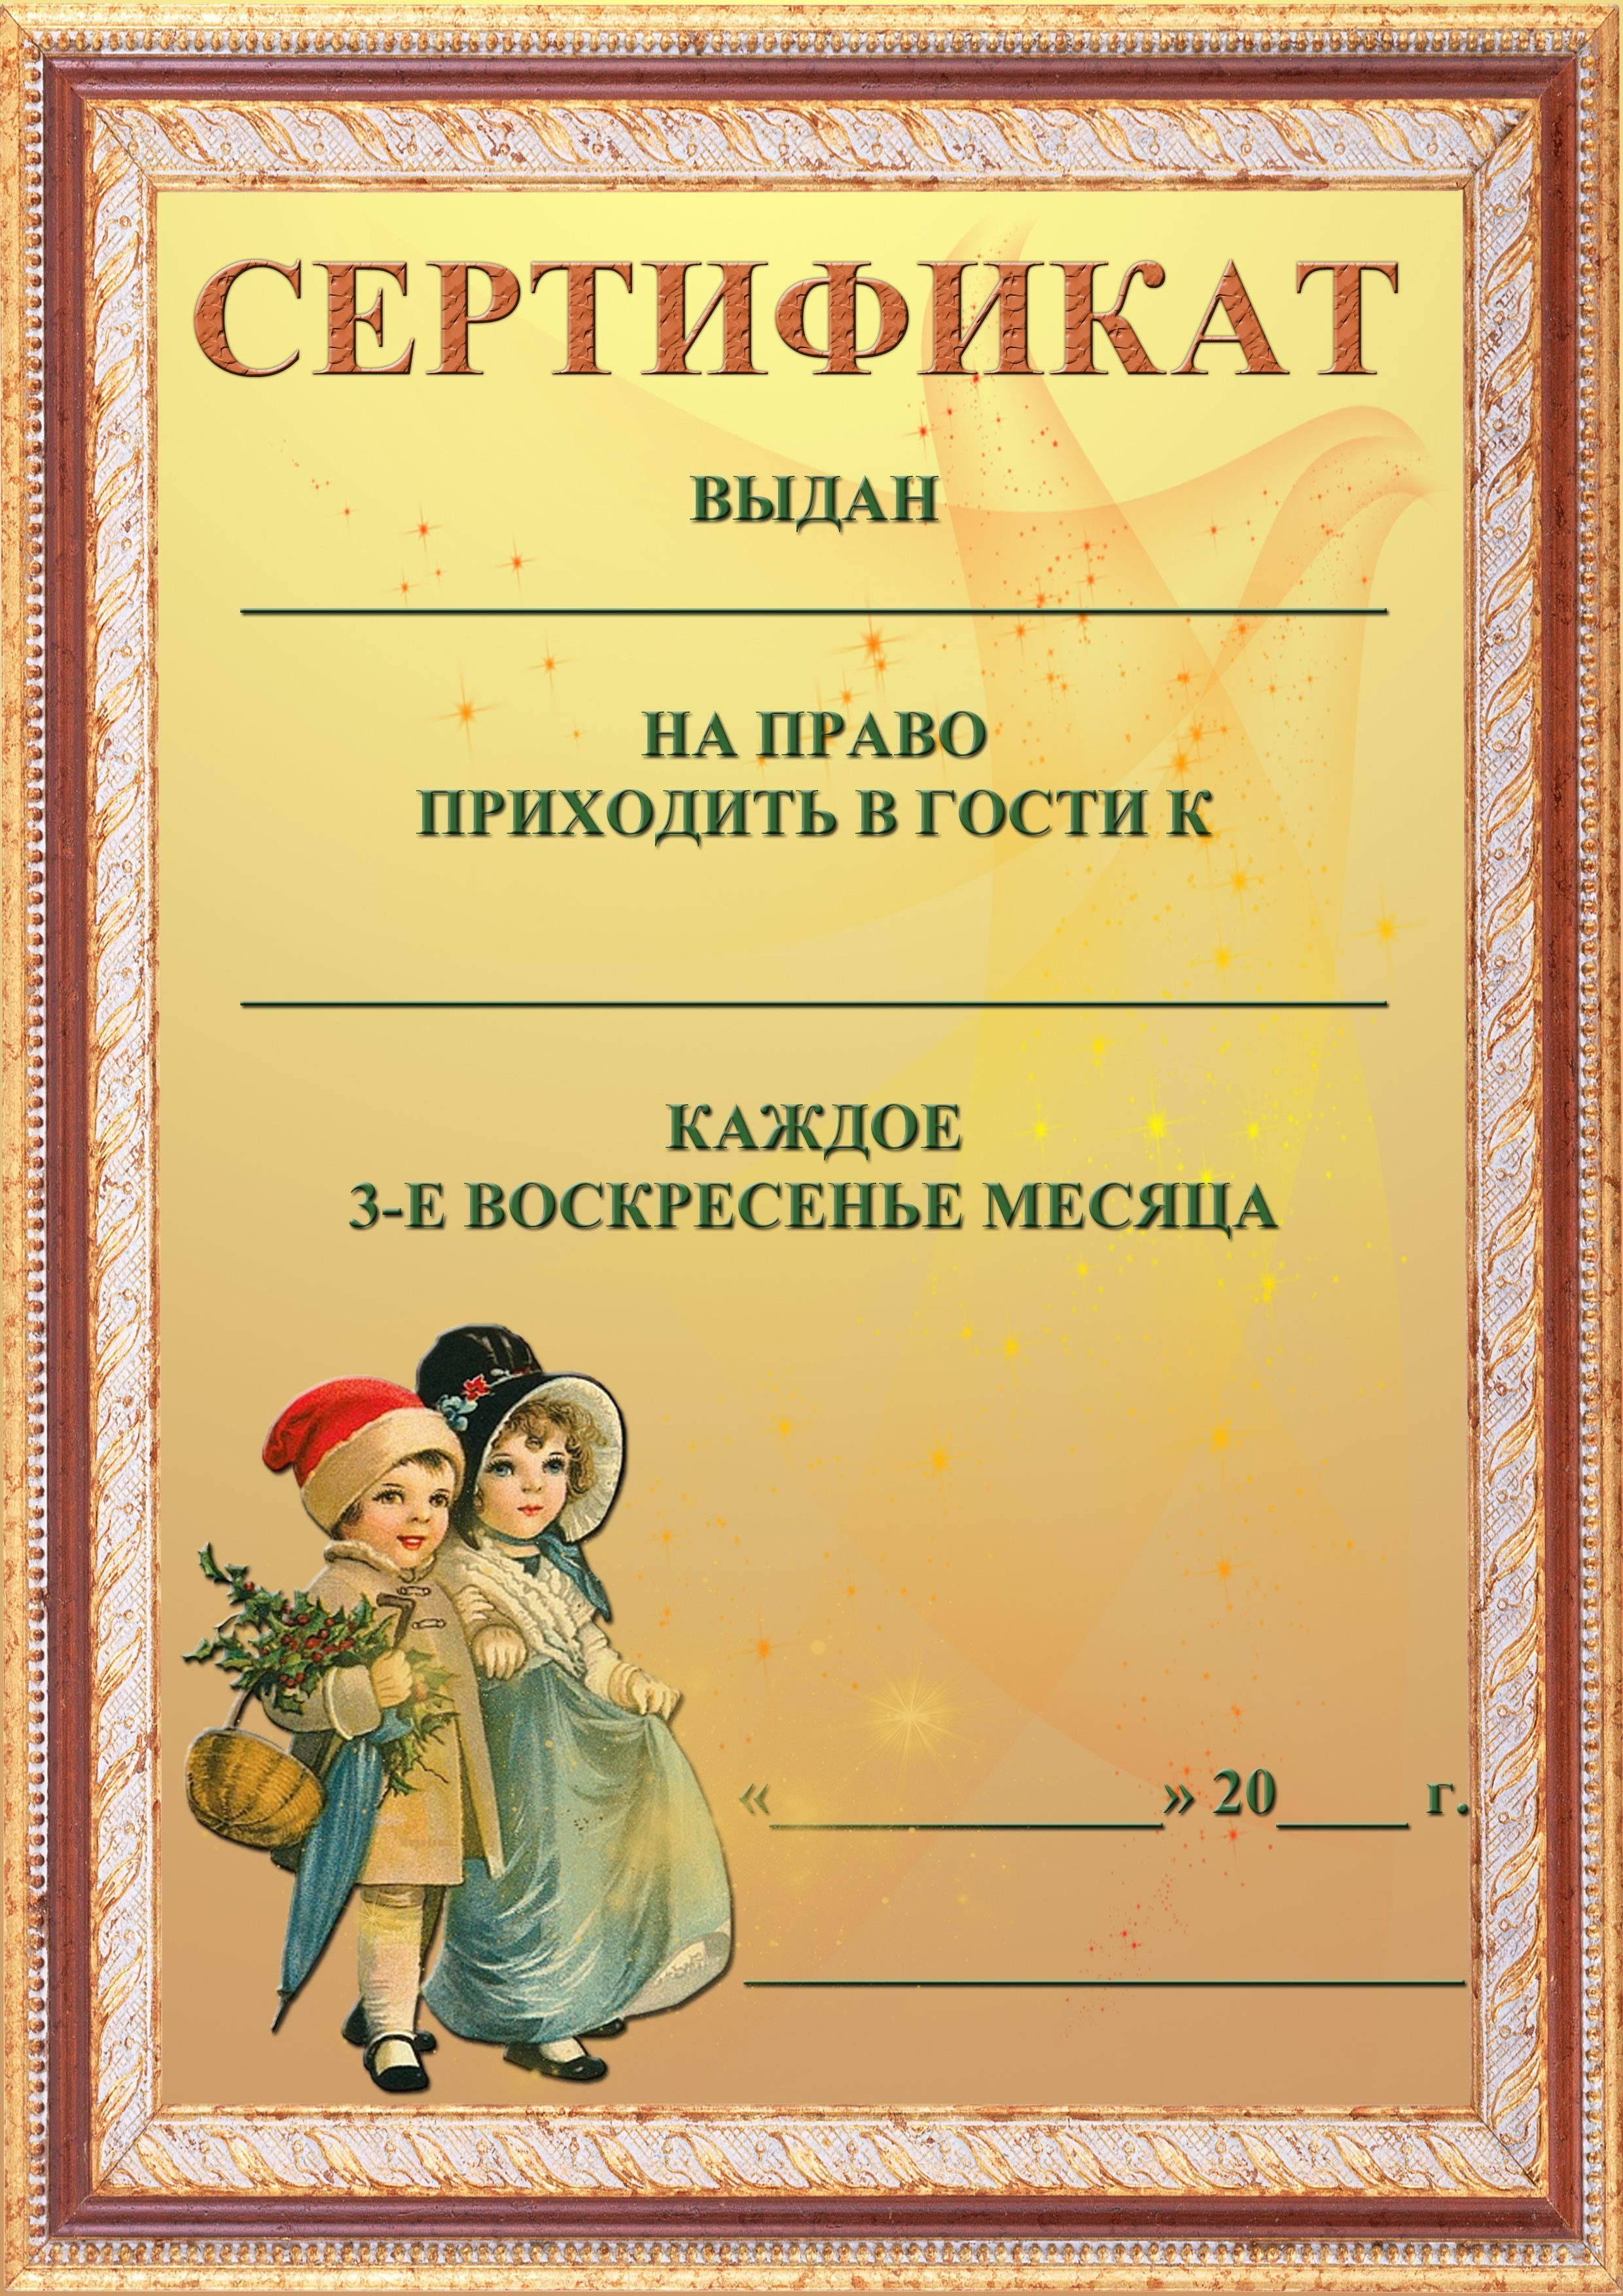 Сертификат образец 4 фото